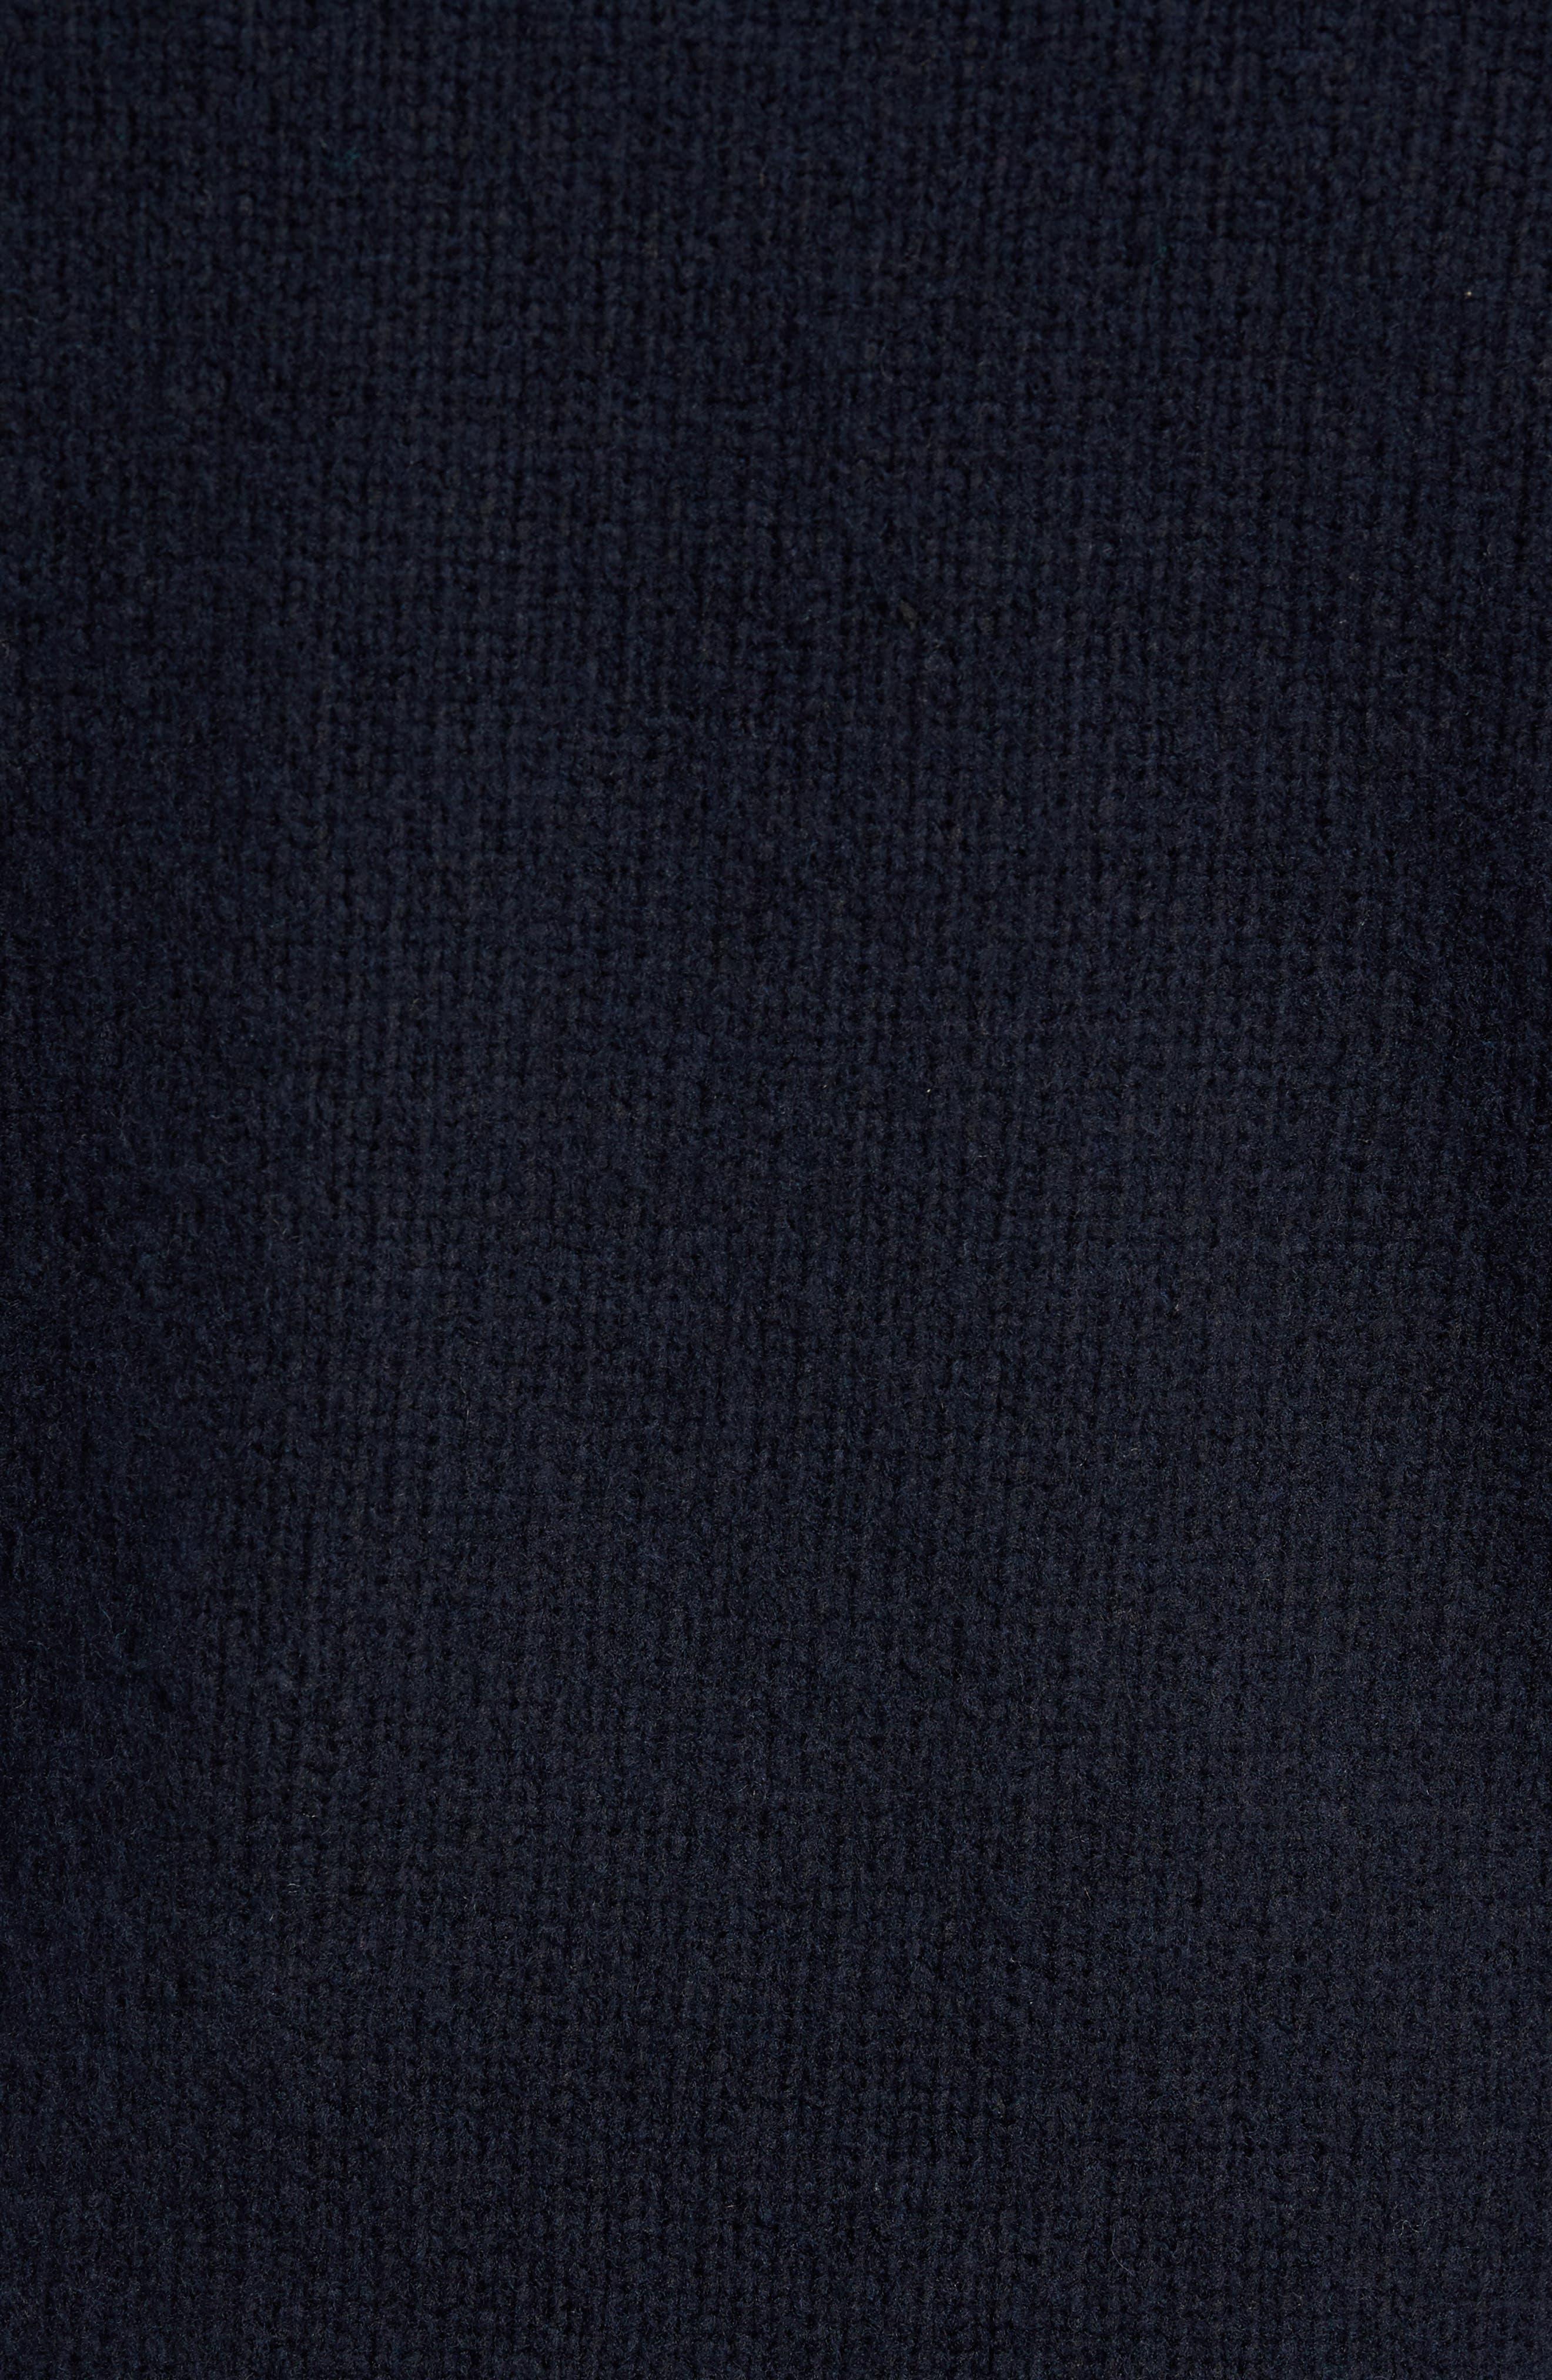 Fuzzy Deep V-Neck Wool Blend Sweater,                             Alternate thumbnail 10, color,